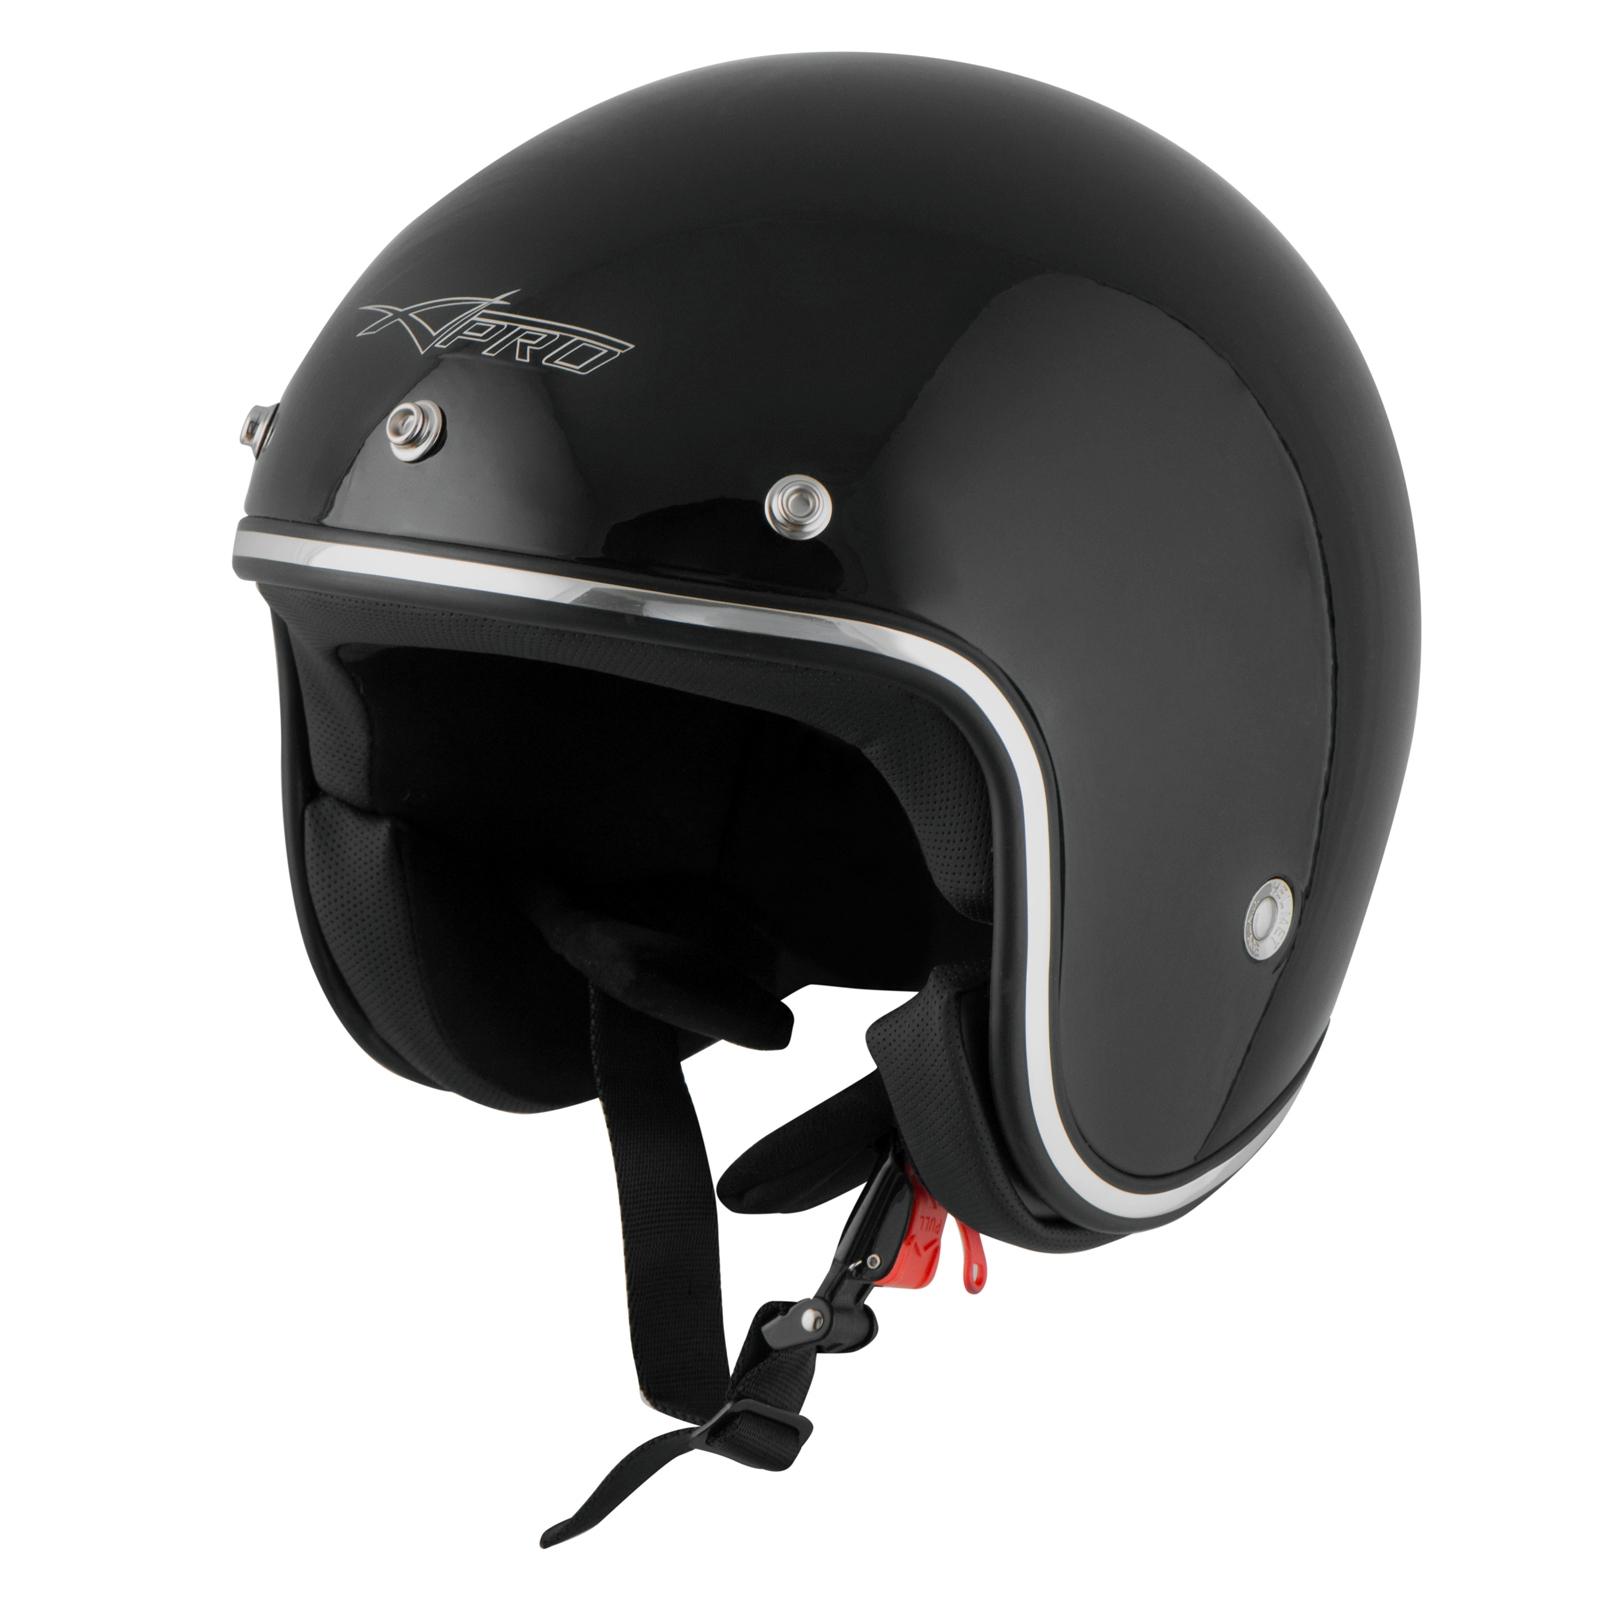 Casque-Moto-Jet-Kustom-Demi-Scooter-ECE-22-05-approbation miniature 9